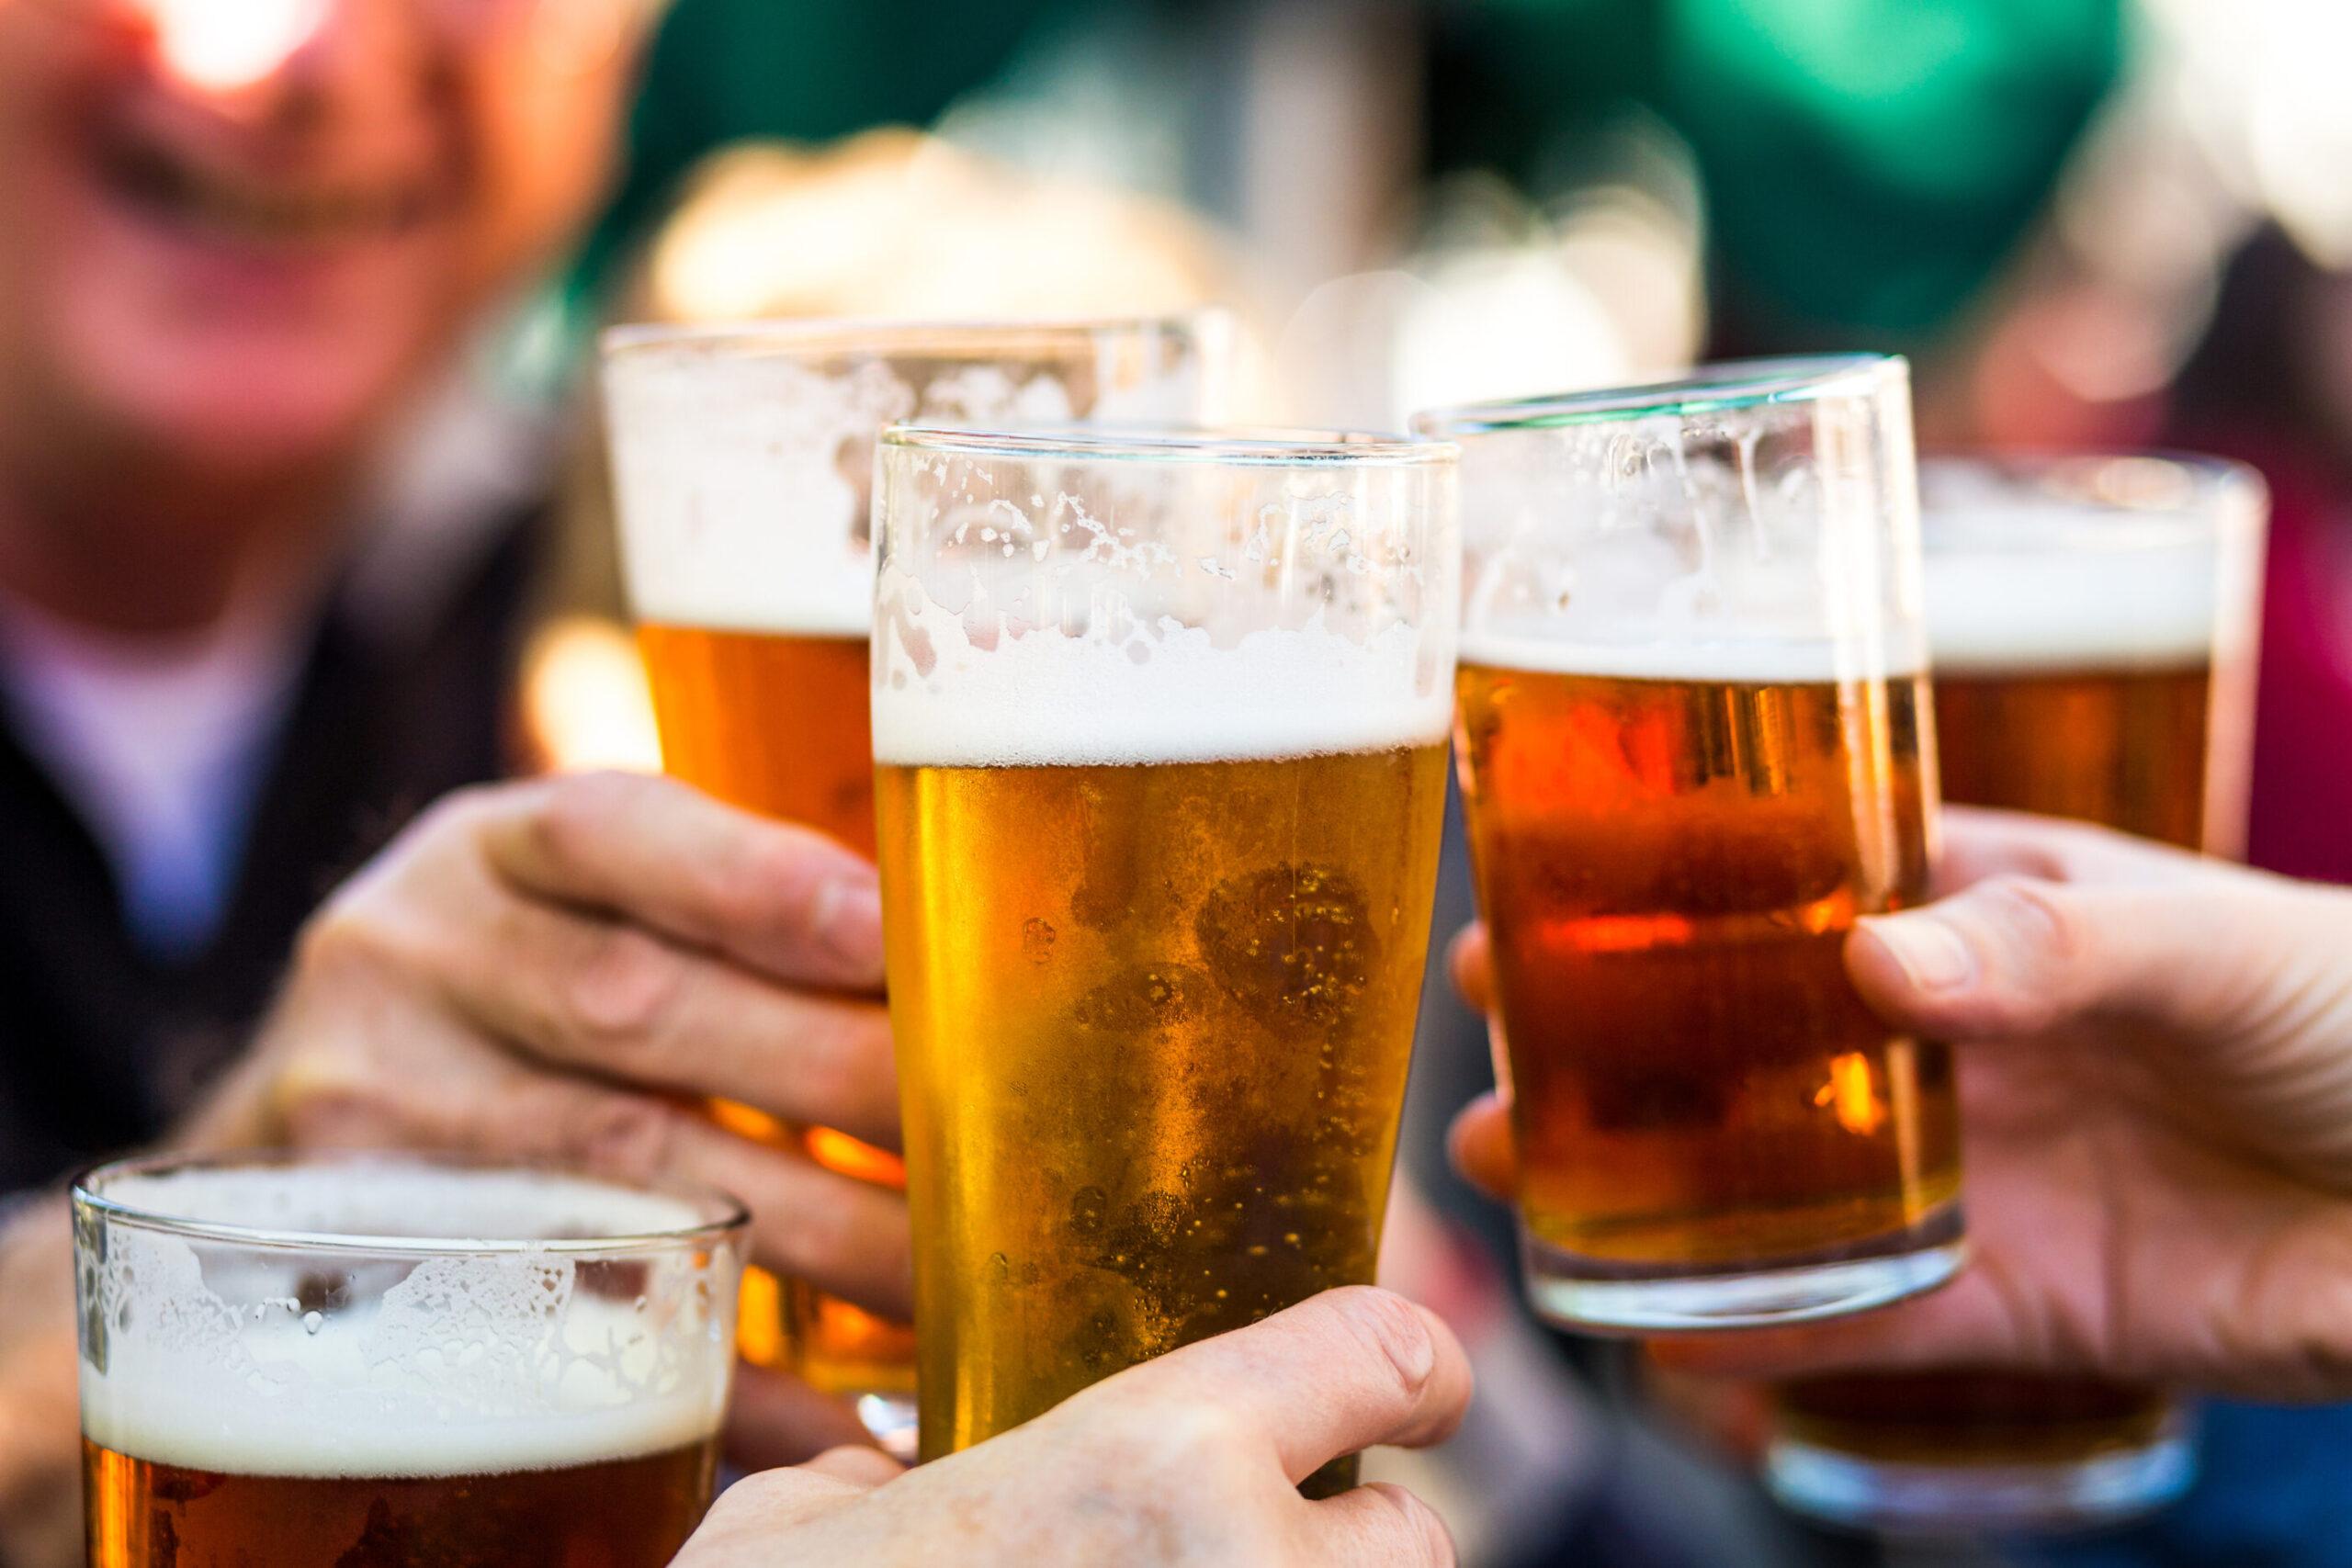 Find the best San Diego breweries to visit.